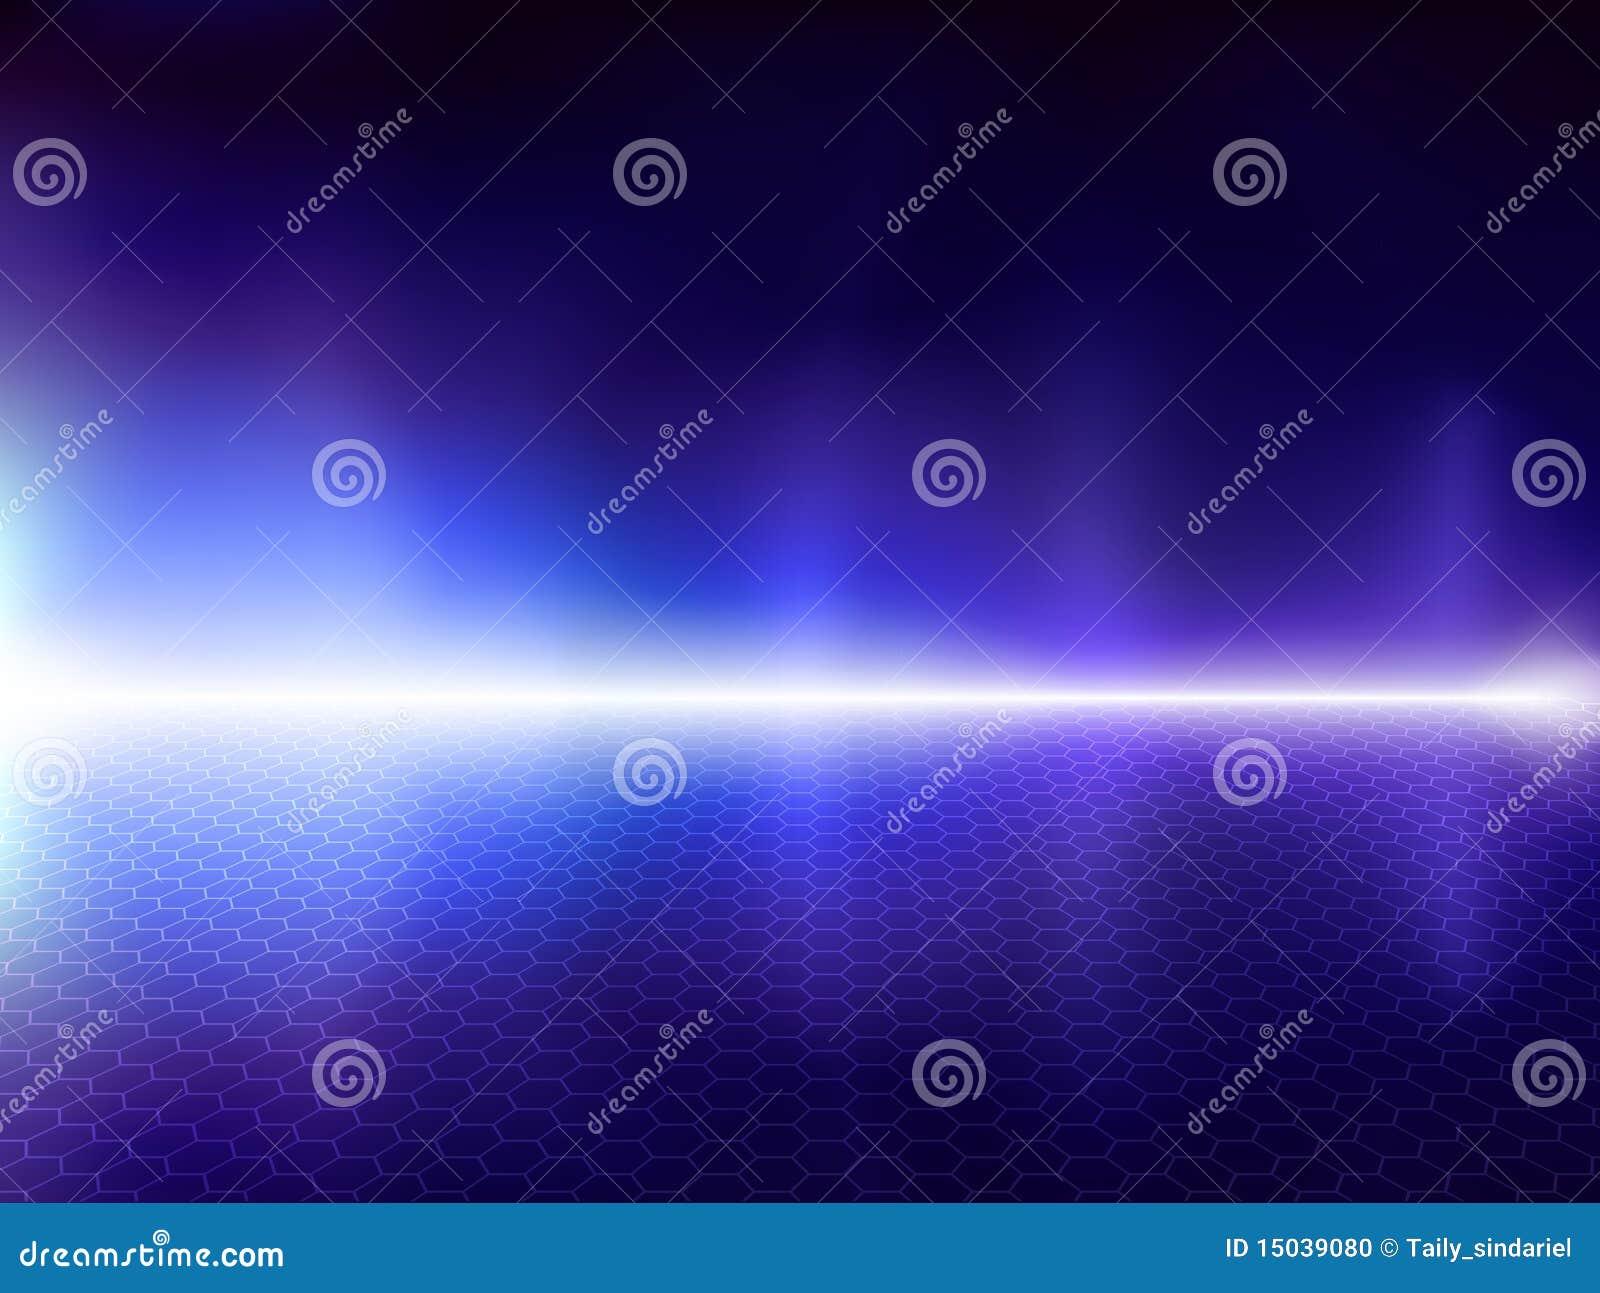 Blue computer background